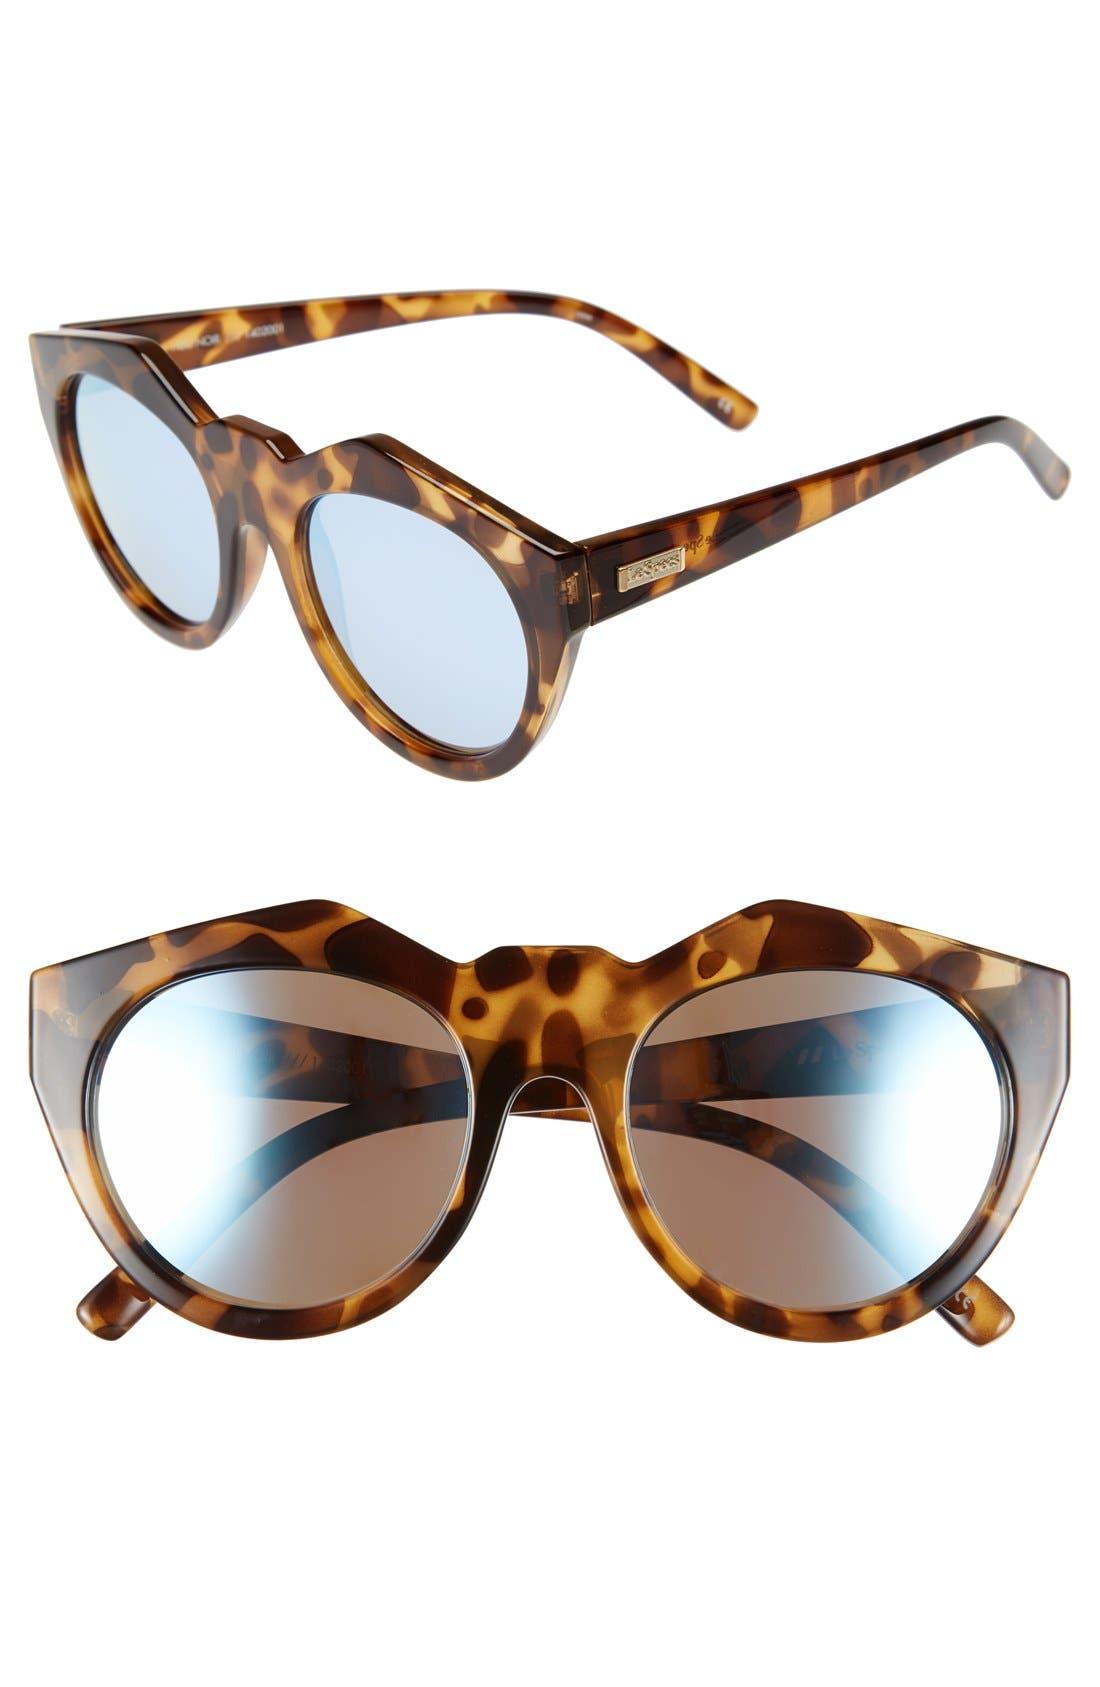 Alternate Image 1 Selected - Le Specs 'Neo Noir' 53mm Oversized Sunglasses